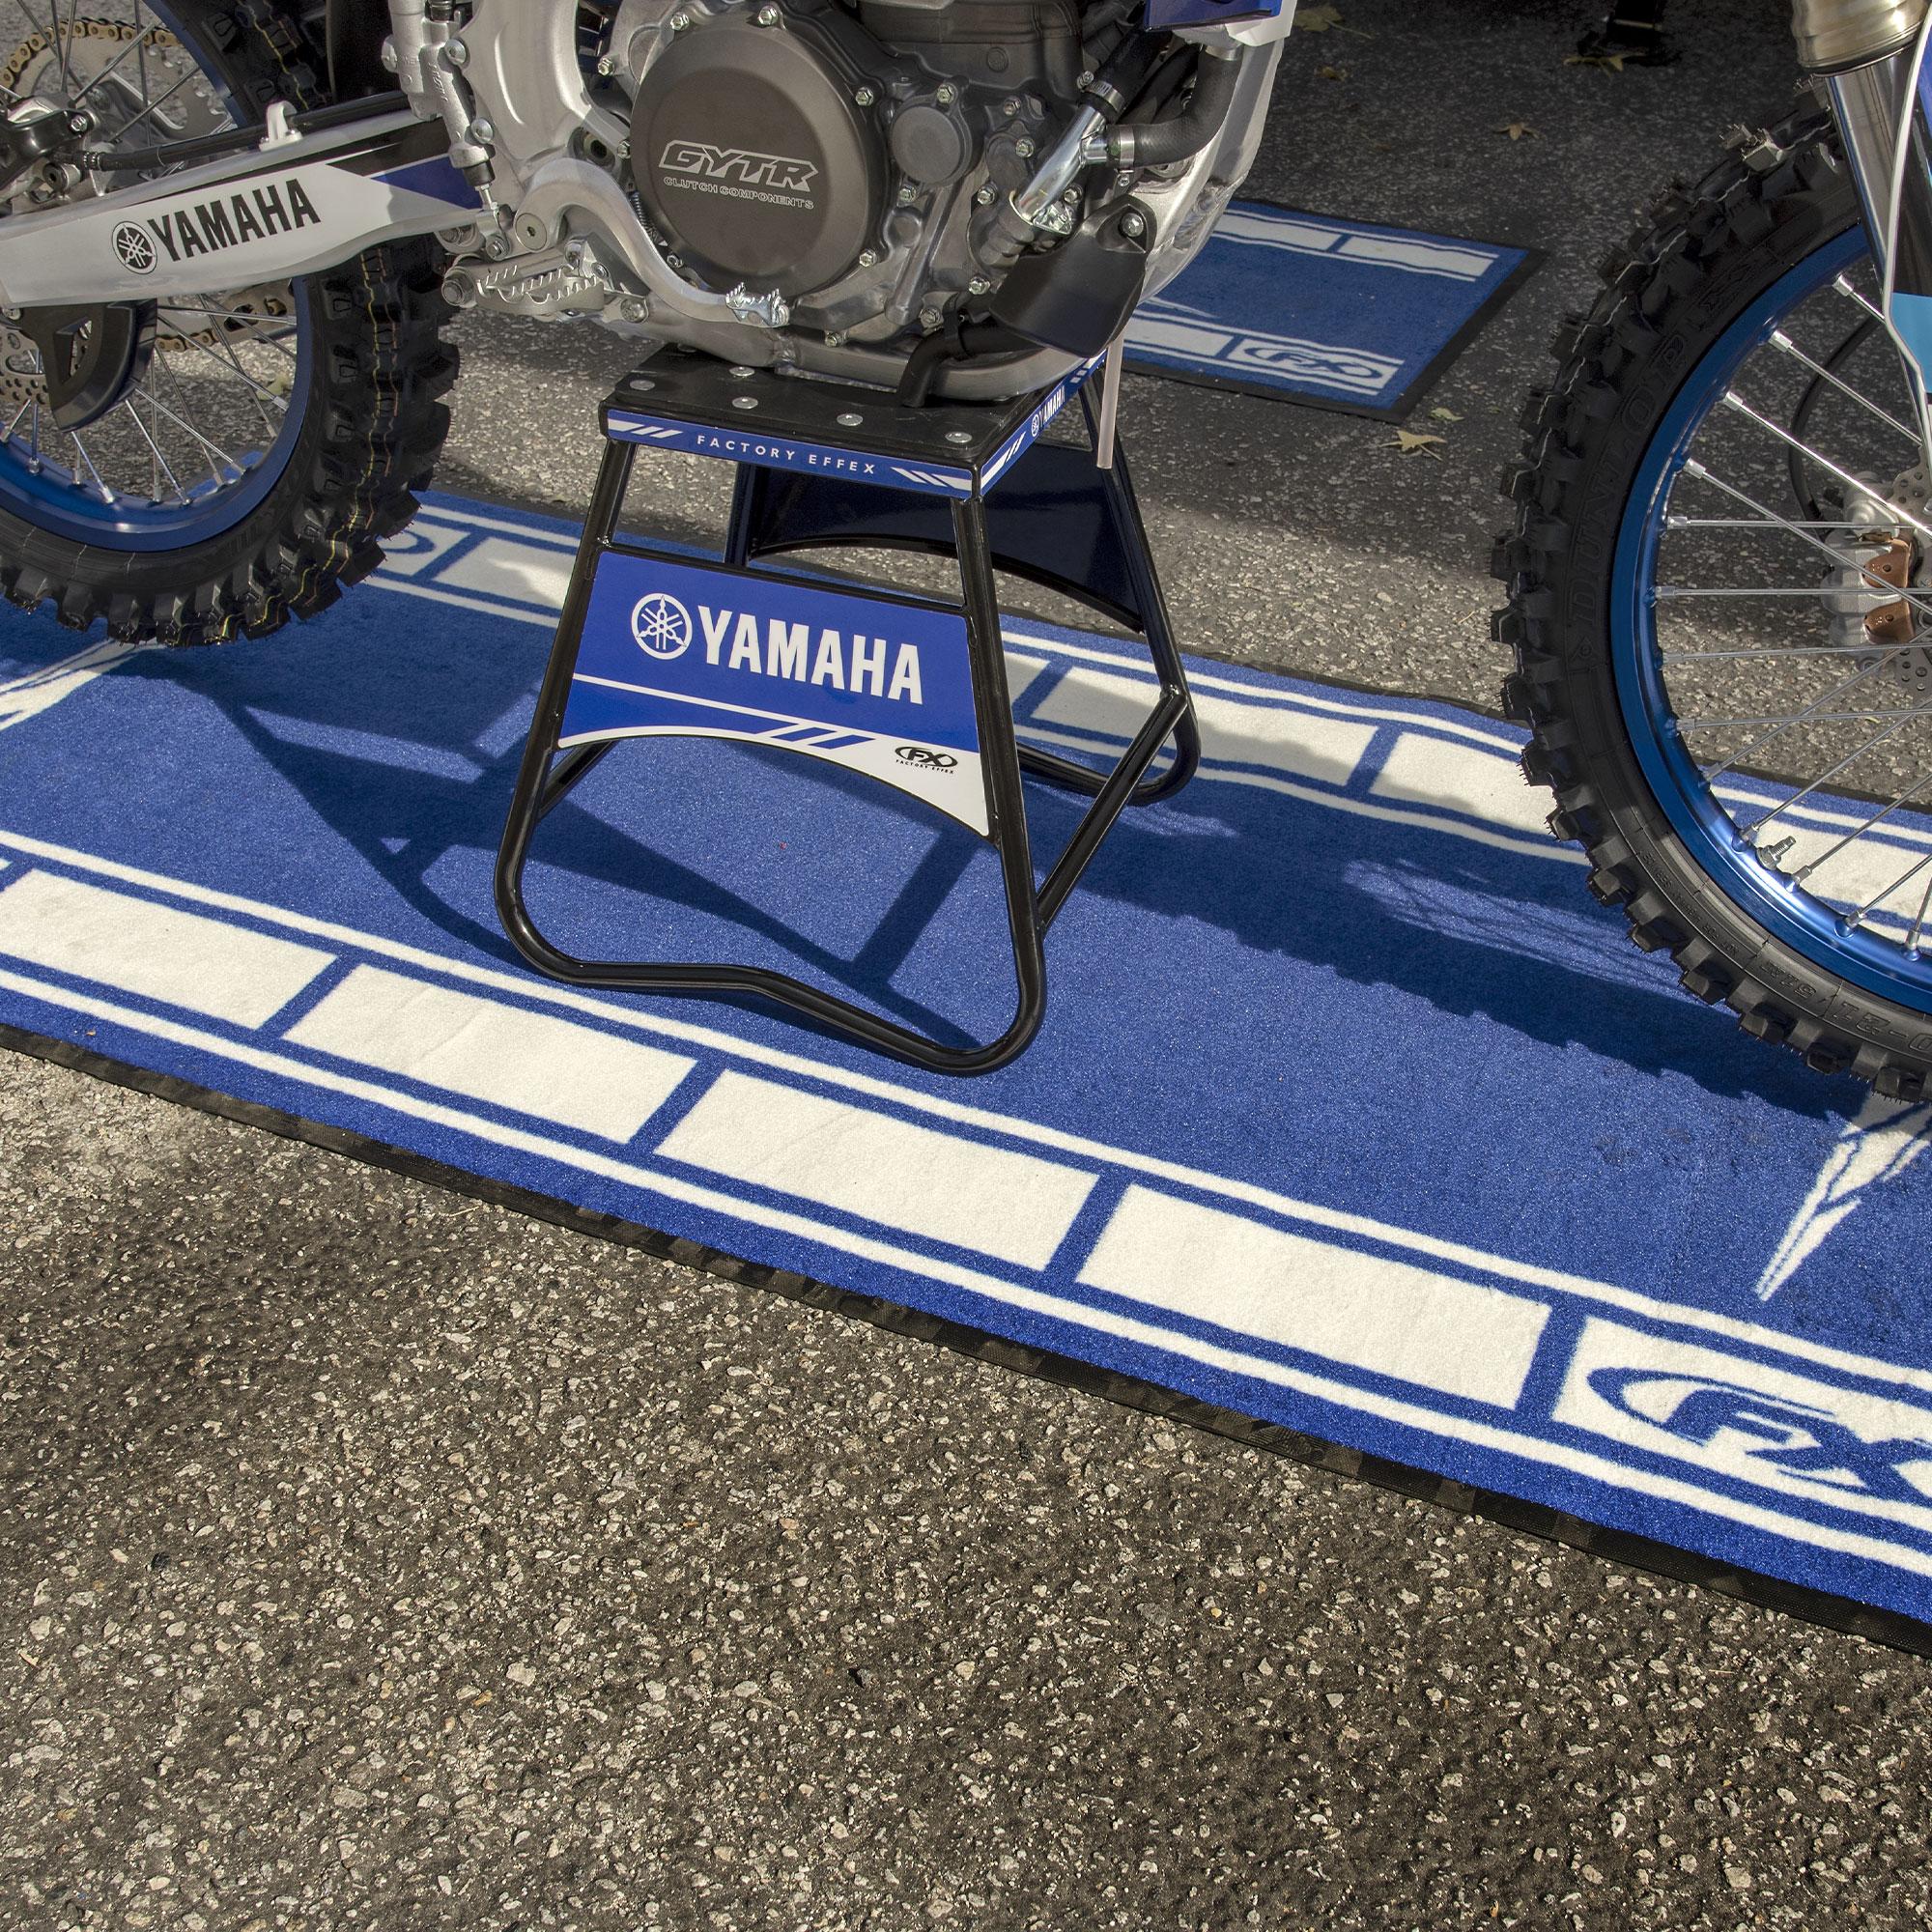 Yamaha bike mat with bike sitting on stand